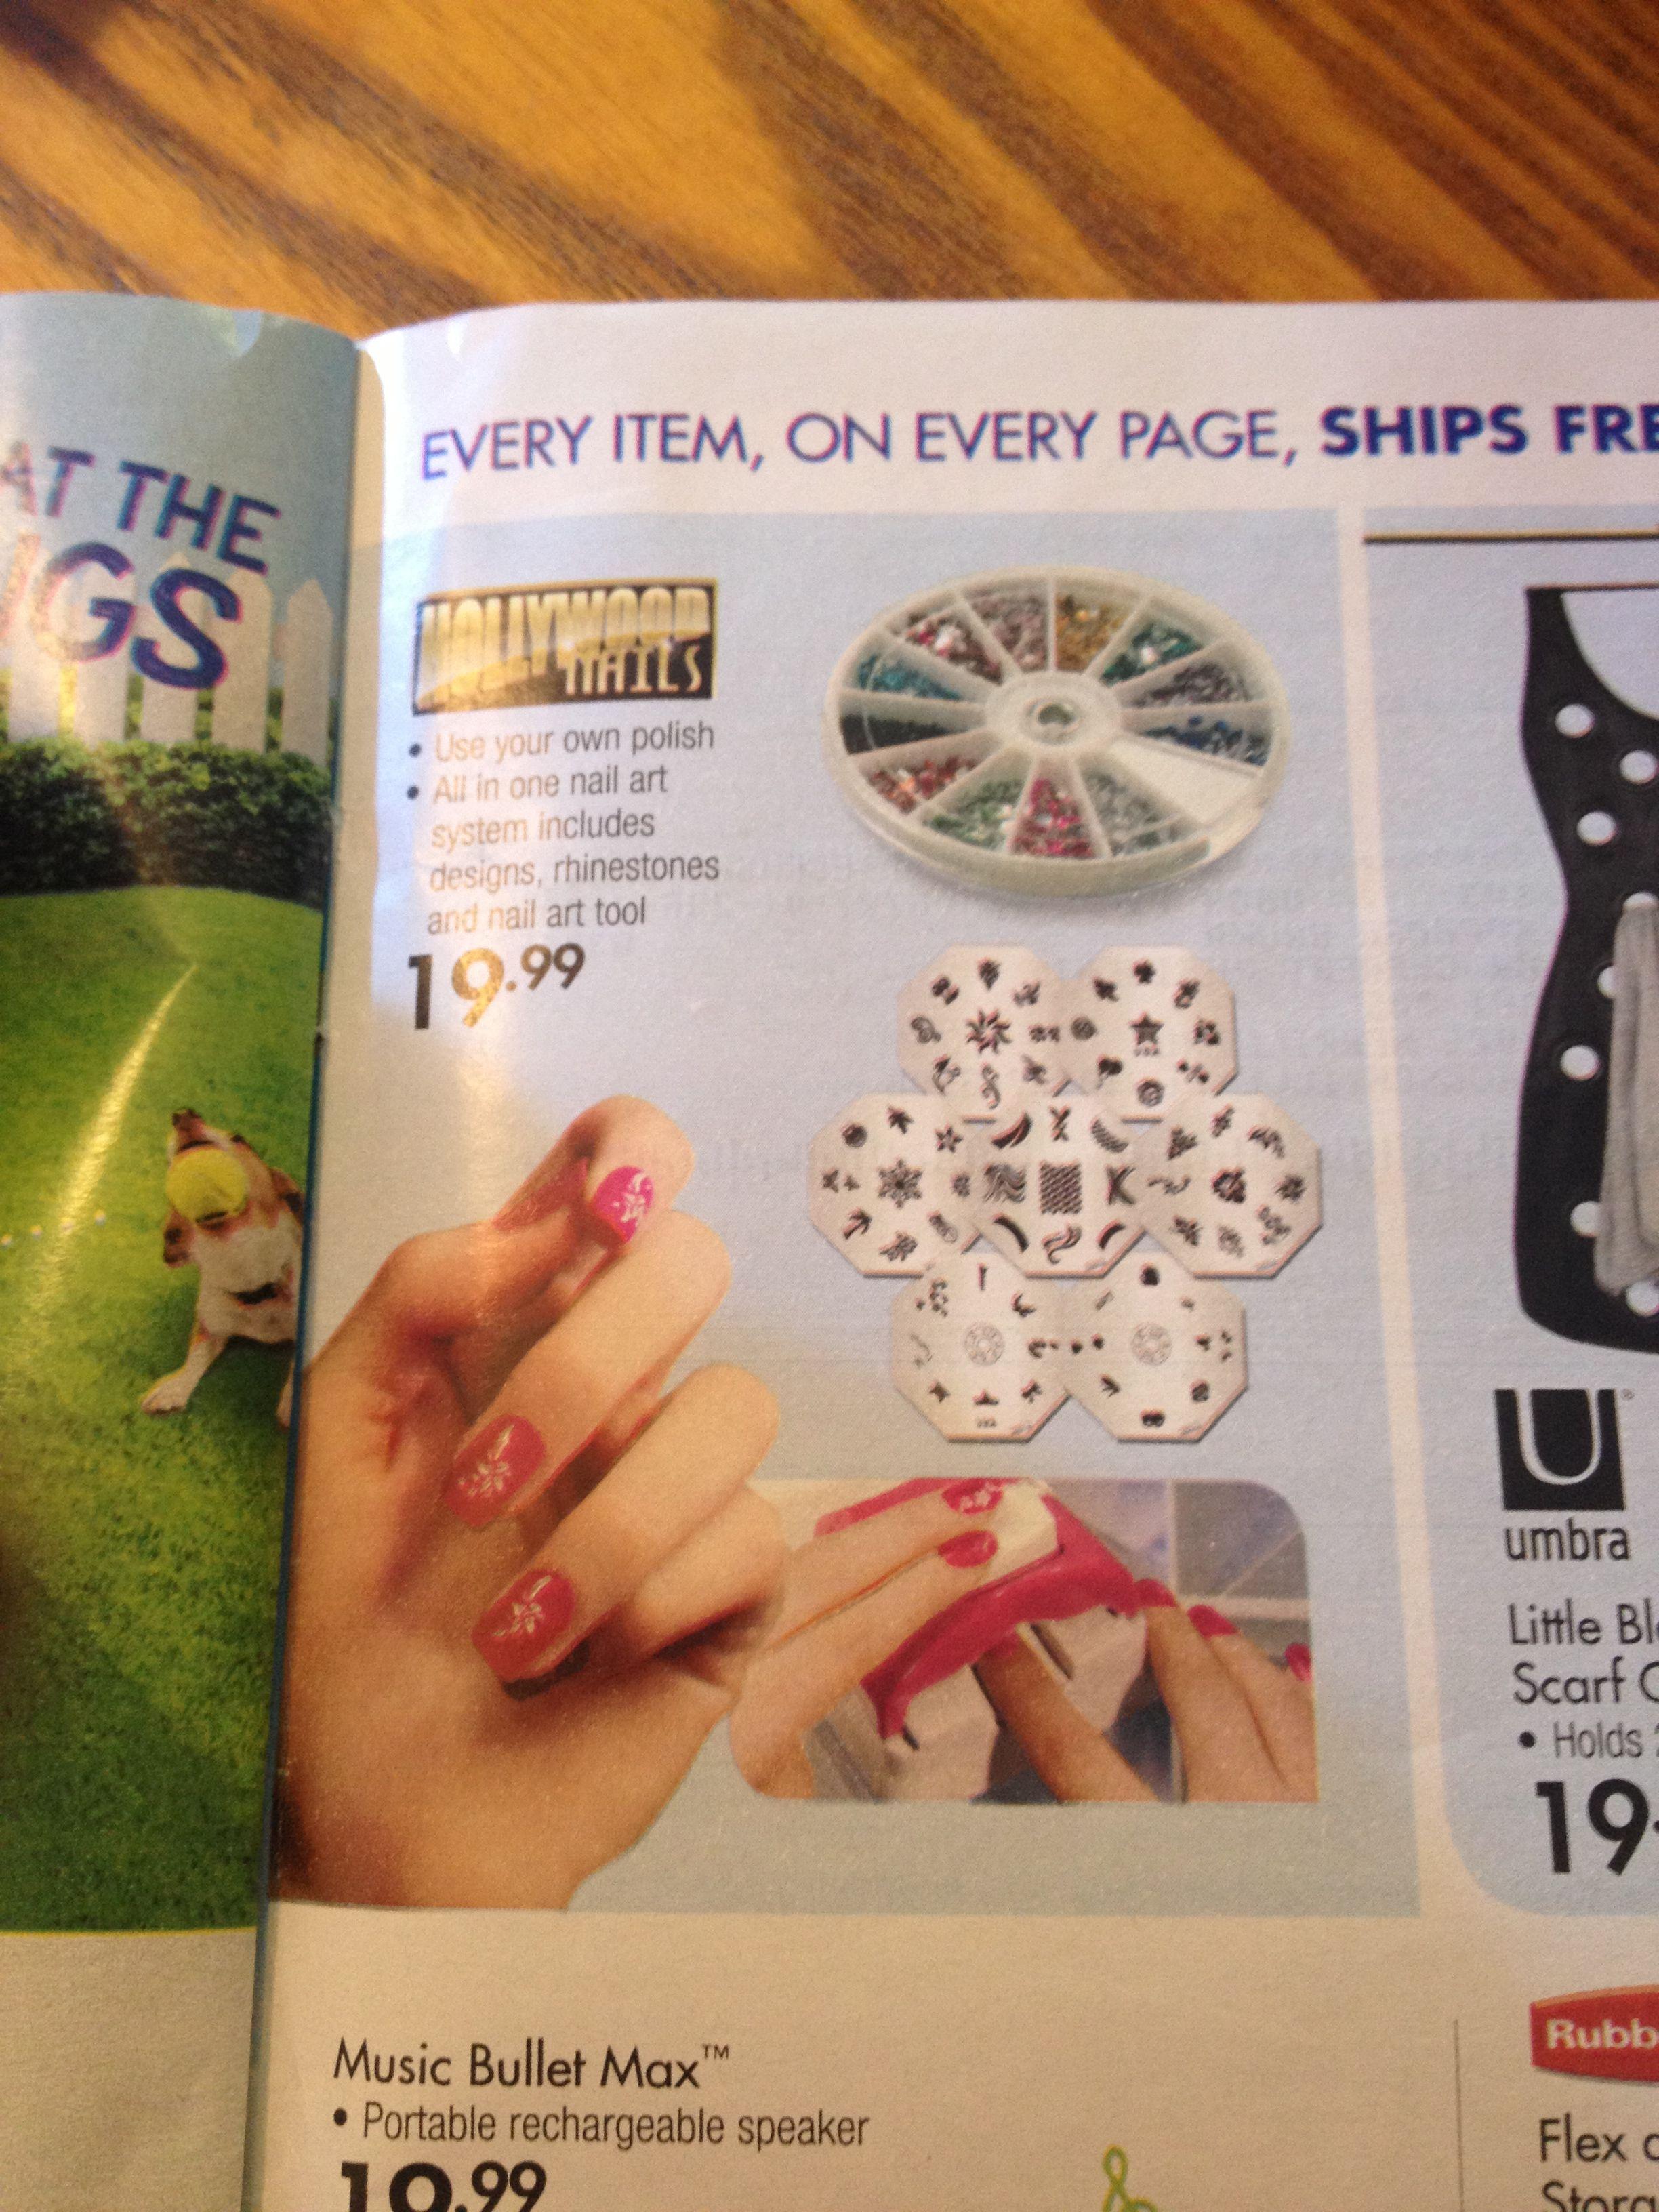 Nail art machine | Gift Ideas for Me | Pinterest | Nail art machine